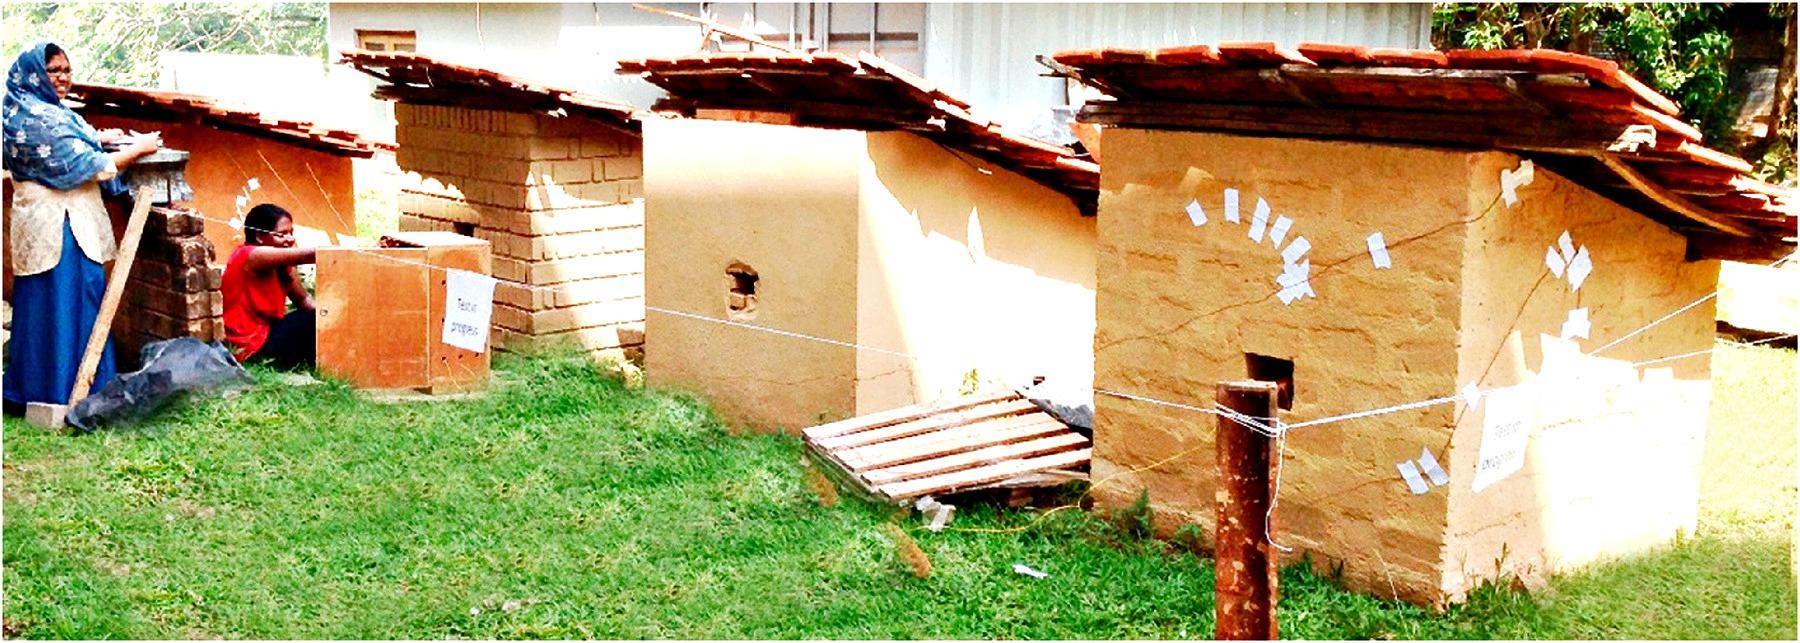 Mud Bricks Best For Cool Green Houses Says Study Scidev Net